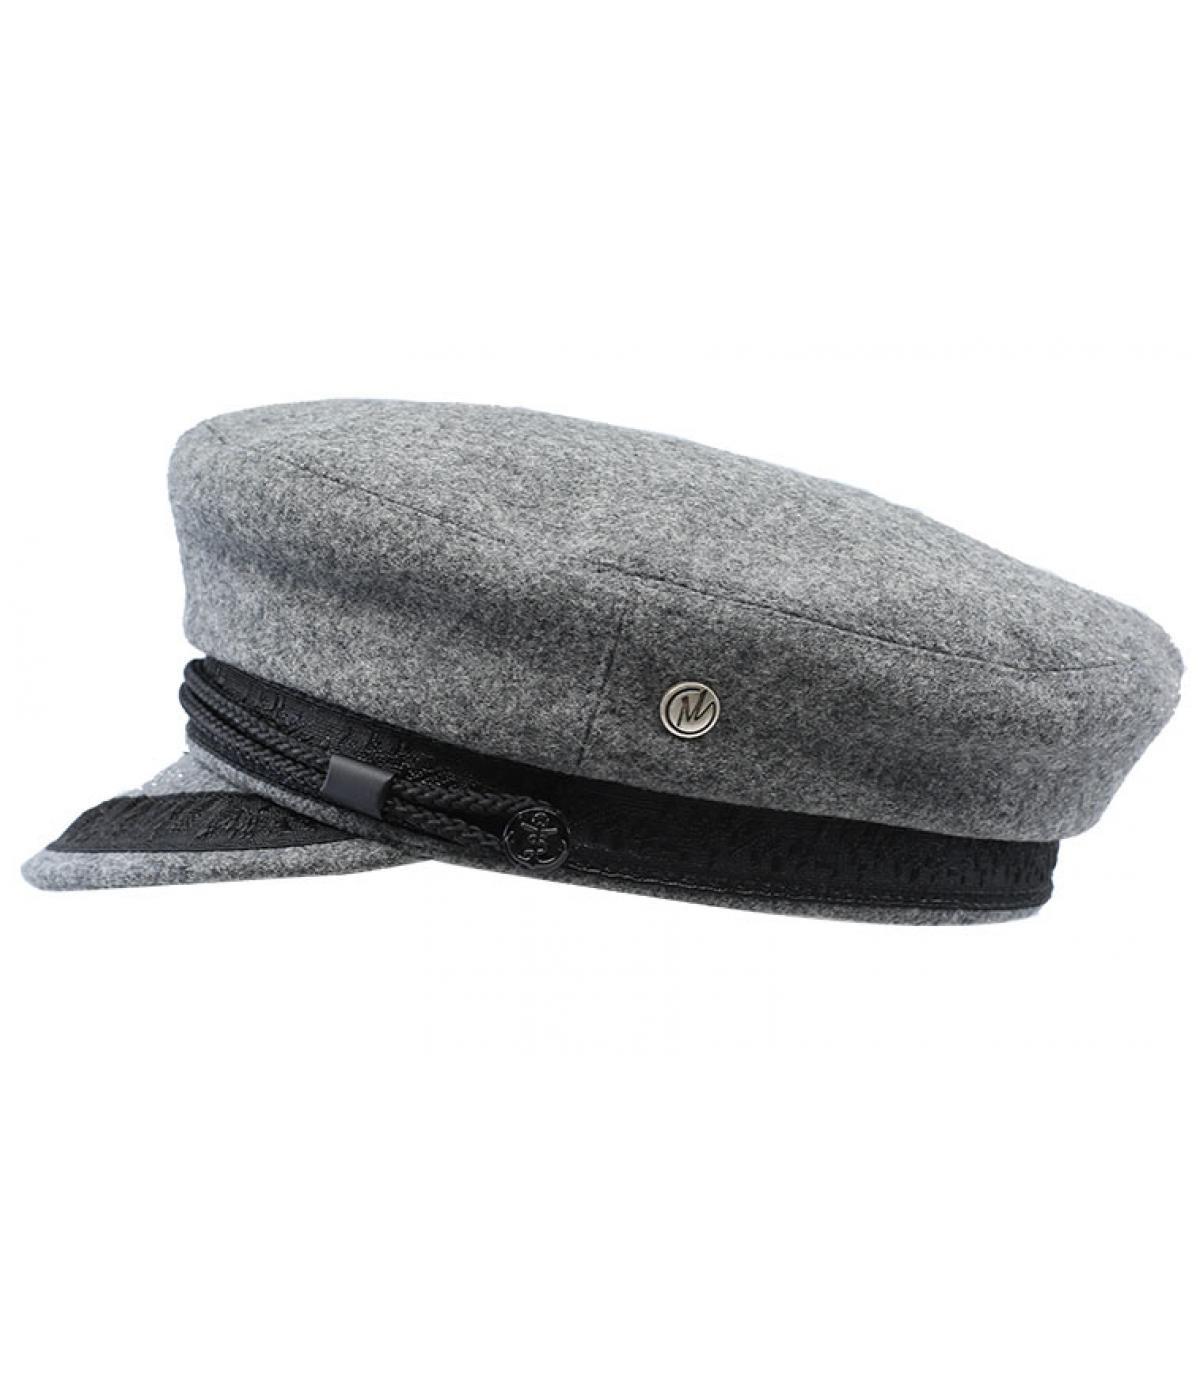 gorra marinera gris claro lana - Clea grey de Modissima. Headict e5a256217d9